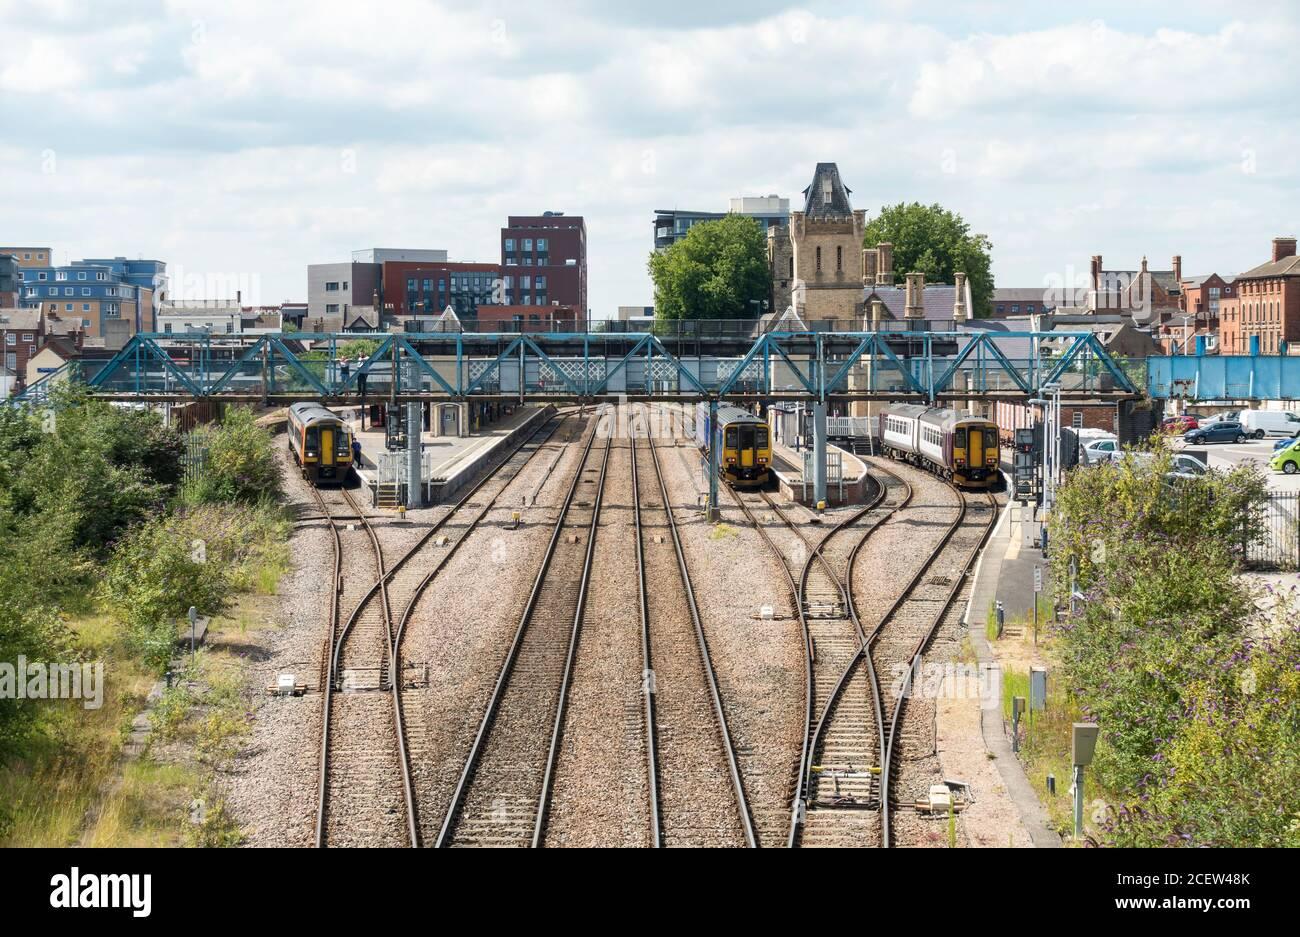 lincoln-railway-station-from-pelham-bridge-july-2020-2CEW48K.jpg